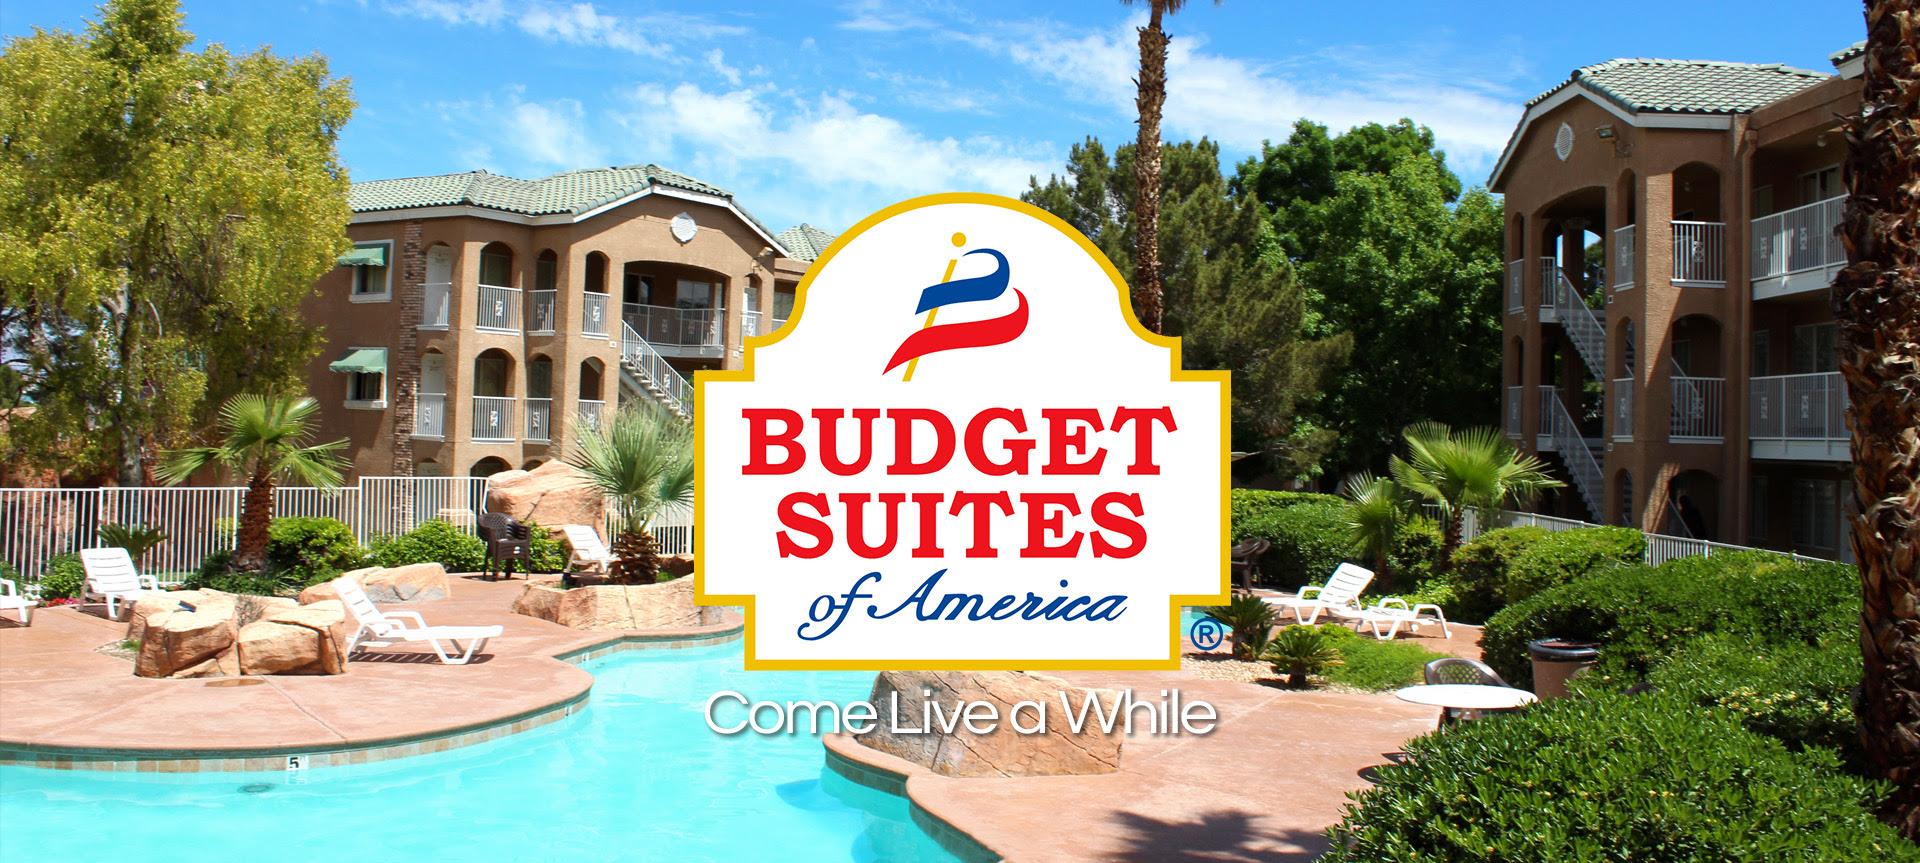 Budget Suites Of America